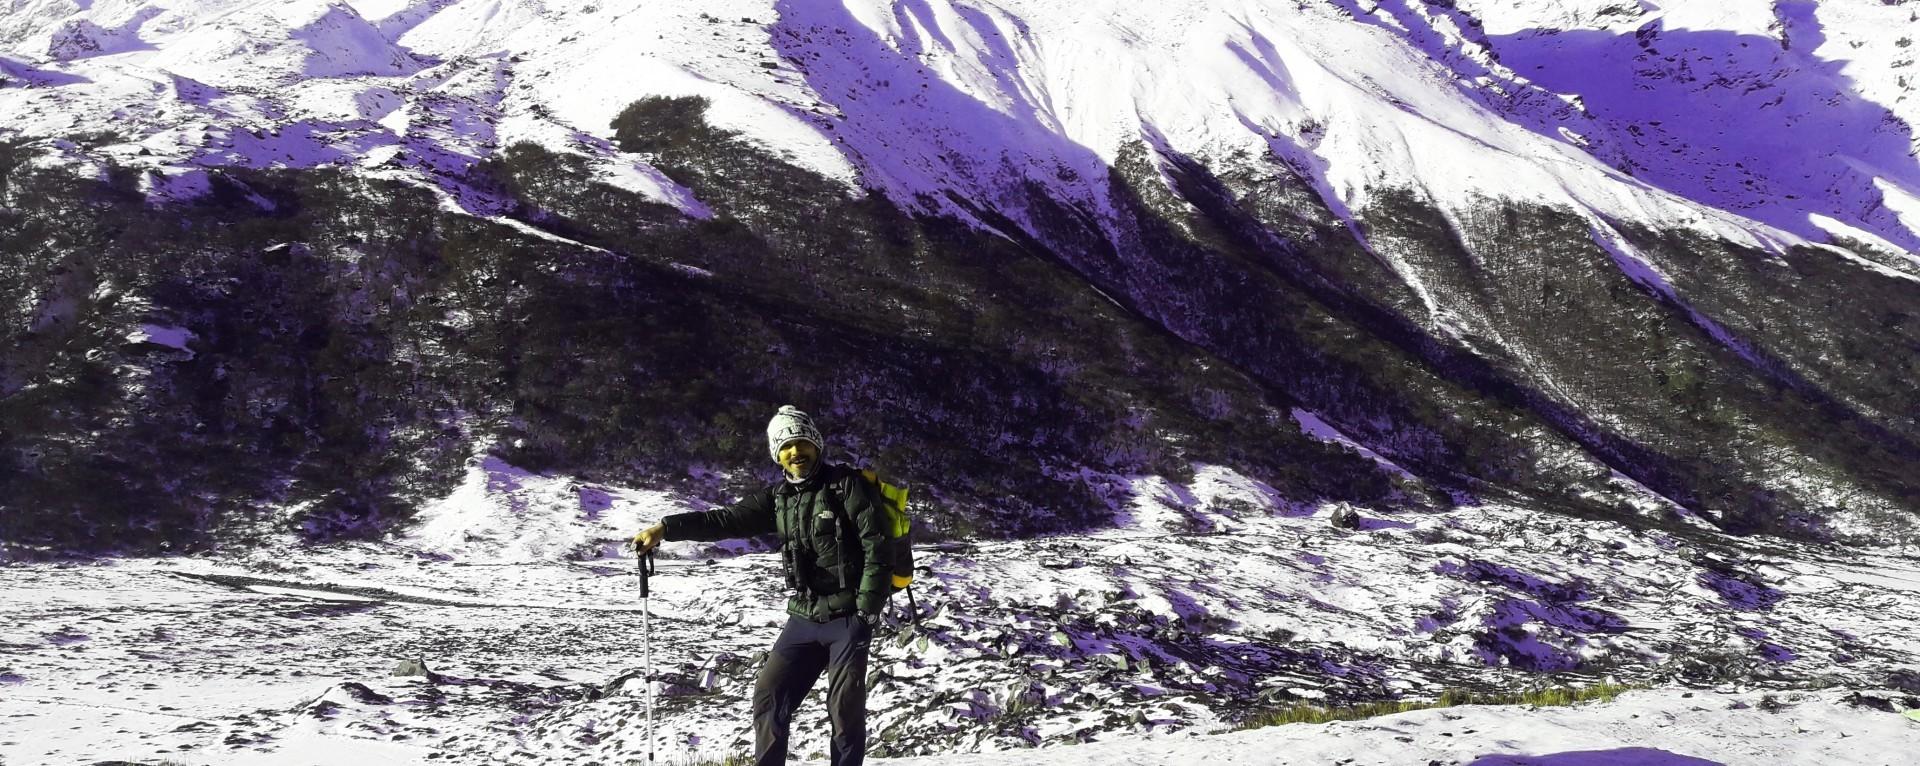 trekking in Khumbu region, Khumbu trekking nepal, khumbu region